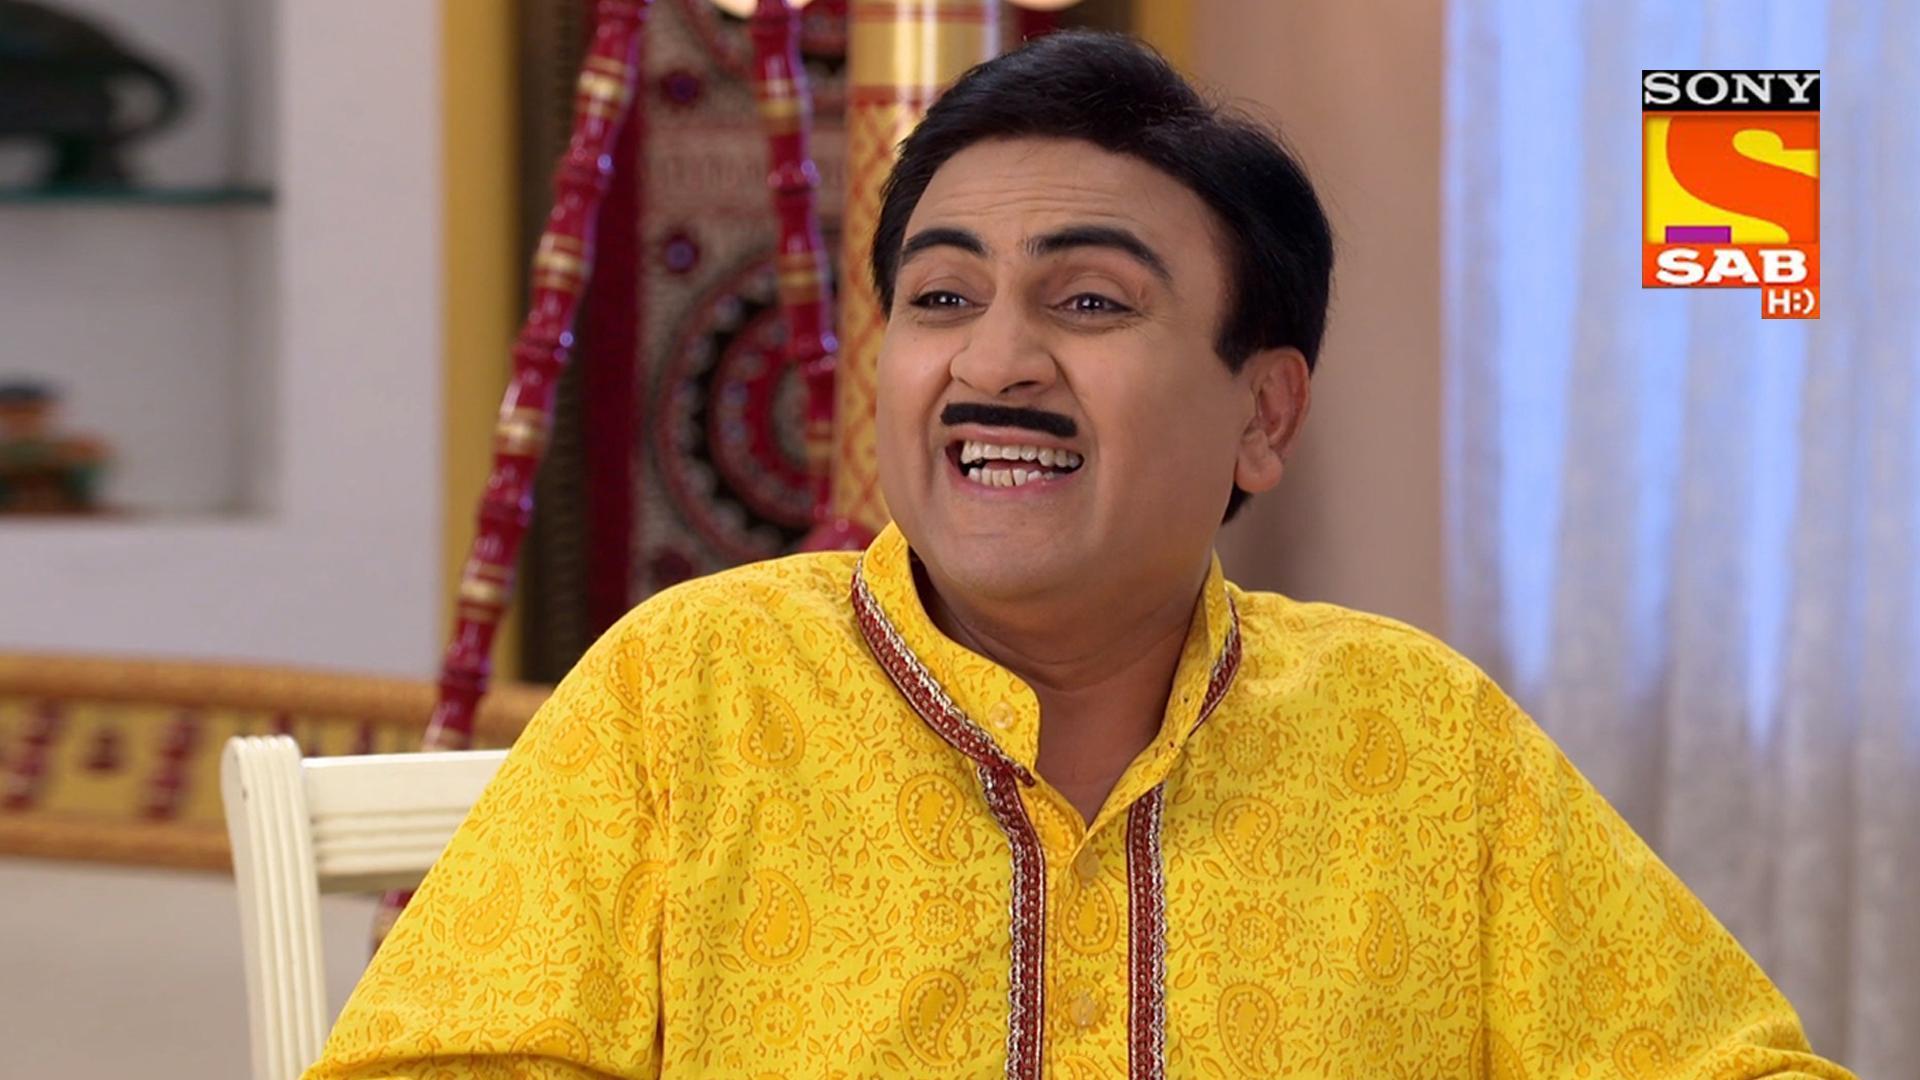 Taarak Mehta Ka Ooltah Chashmah Episode 2865: Ep. 2865 - A